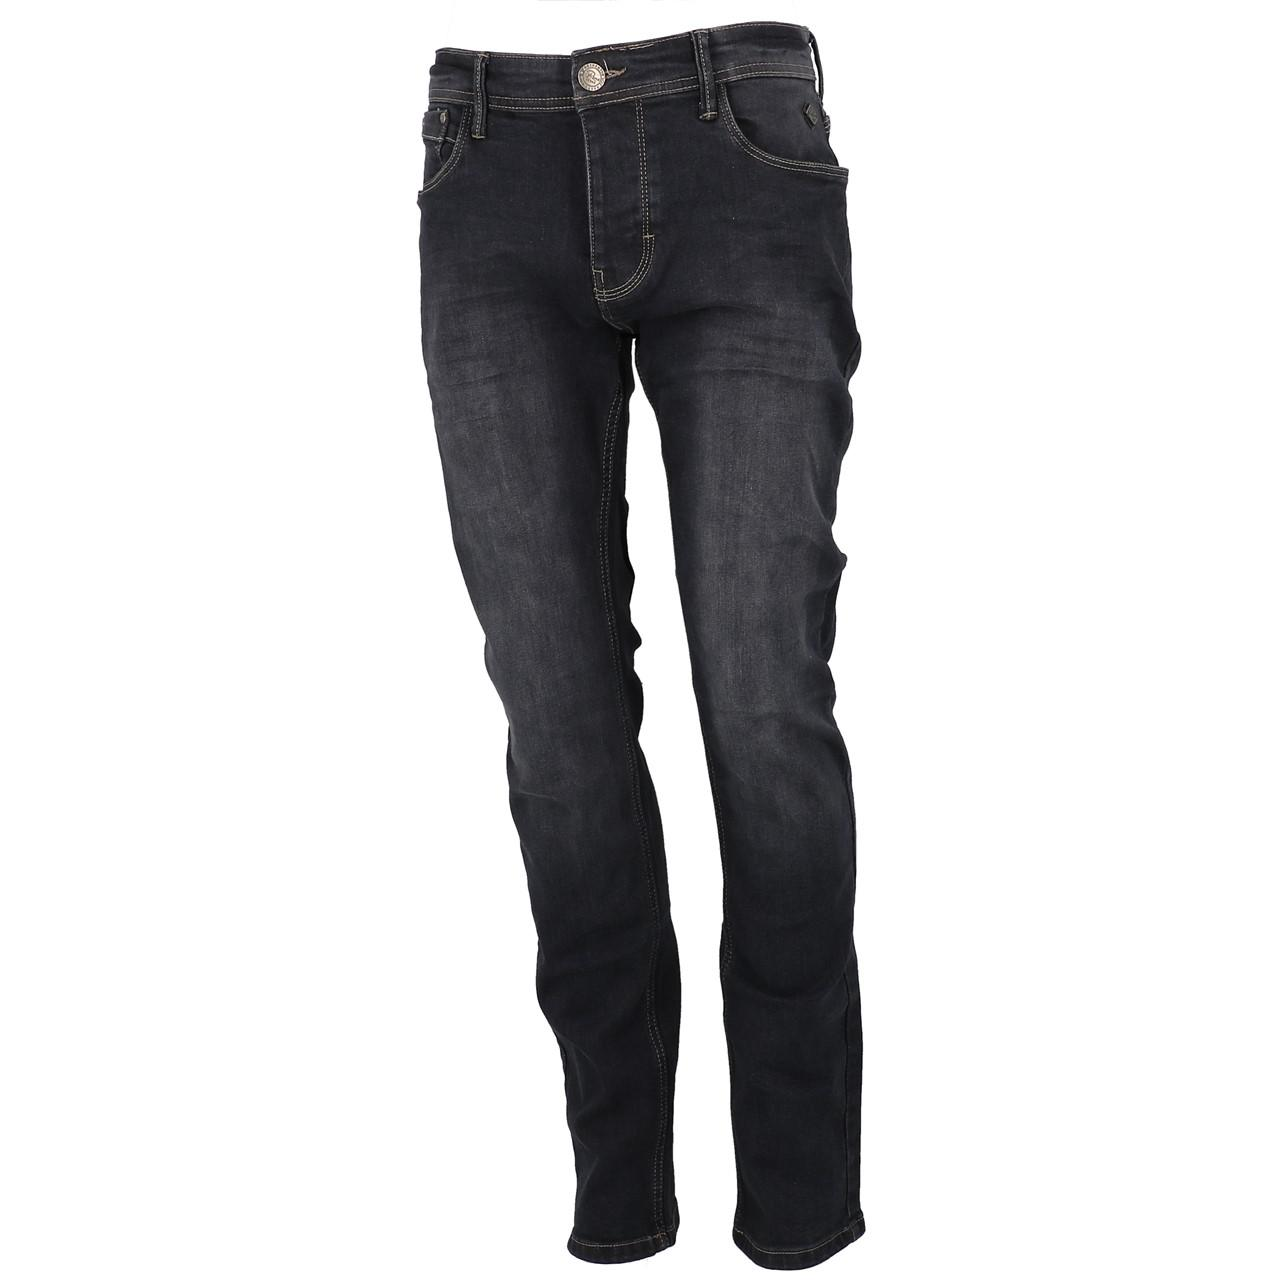 Jeans-Pants-RMS-26-Jeans-Grey-Blue-Regular-Blue-27122-New